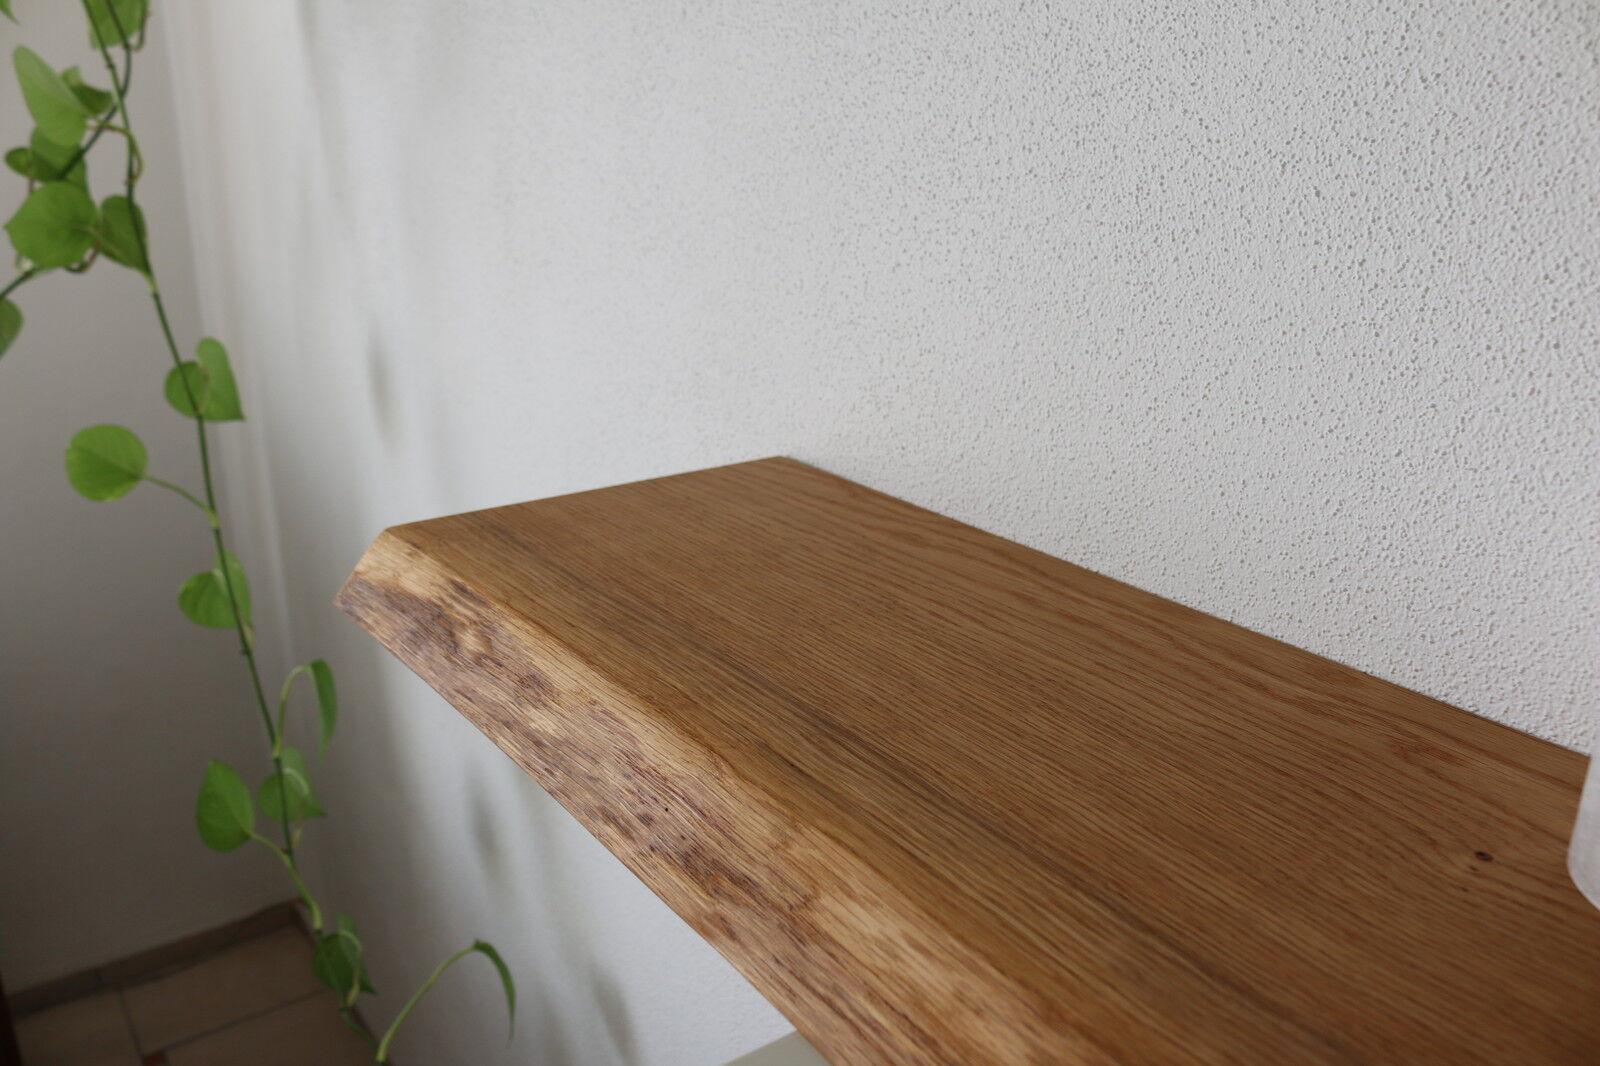 wandboard eiche wild massiv holz board regal steckboard regalbrett baumkante eur 95 00. Black Bedroom Furniture Sets. Home Design Ideas